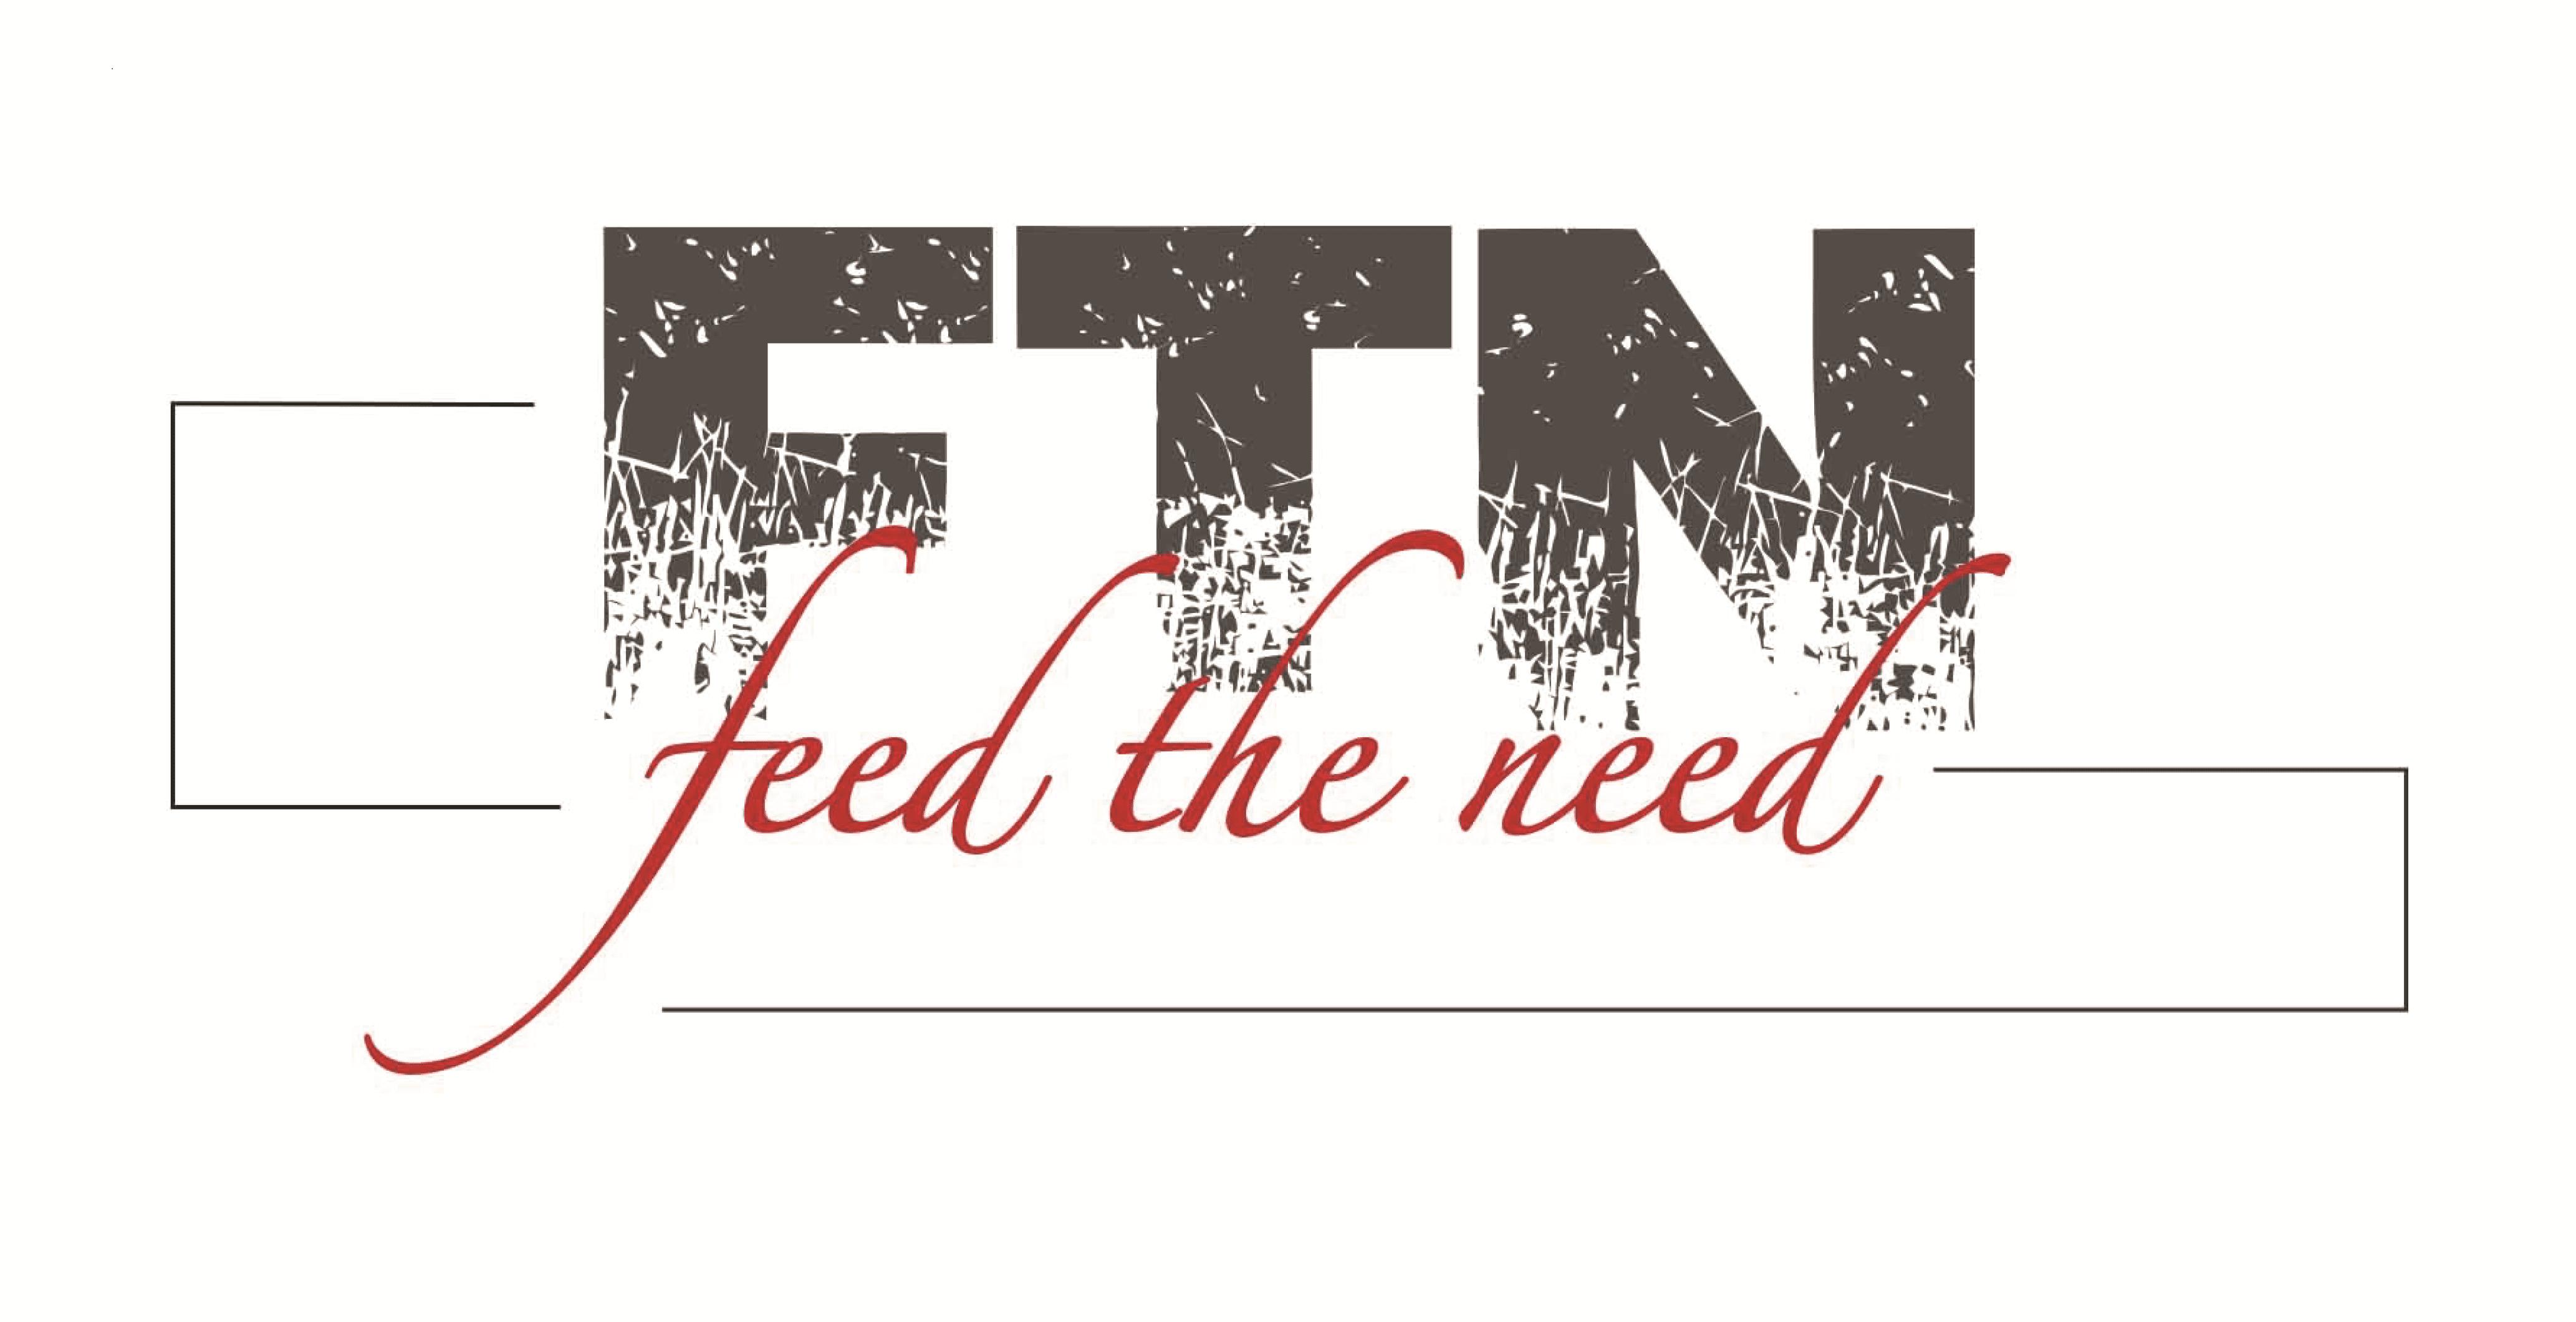 About Our Nonprofit Organization, Atlanta, GA